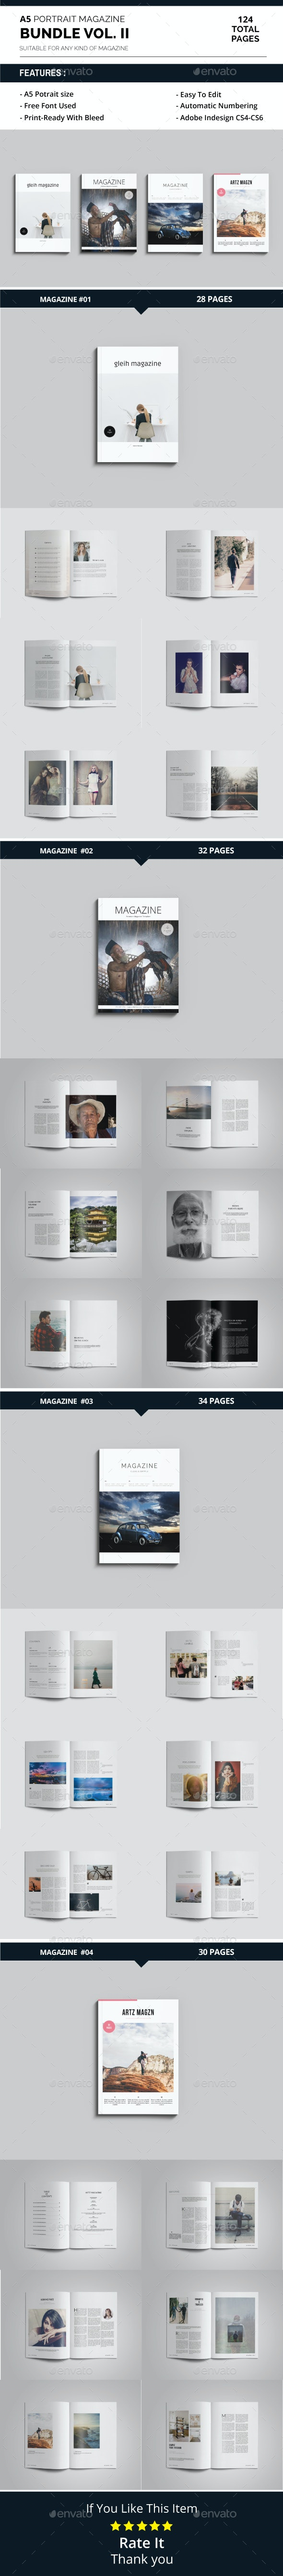 A5 Magazine Bundle Vol. II - Magazines Print Templates